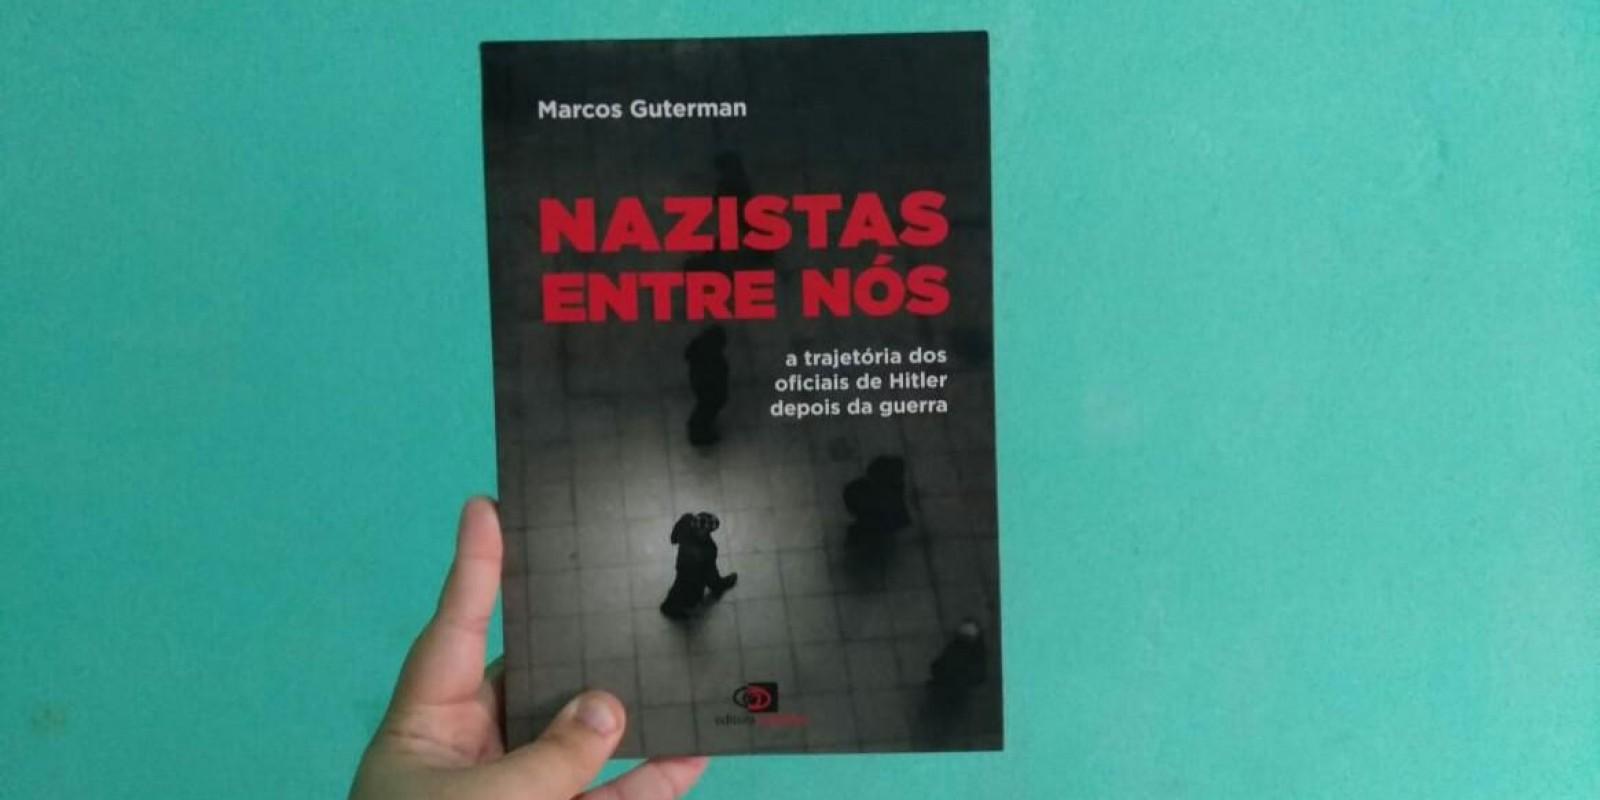 [Nazistas entre nós - Marcos Guterman]